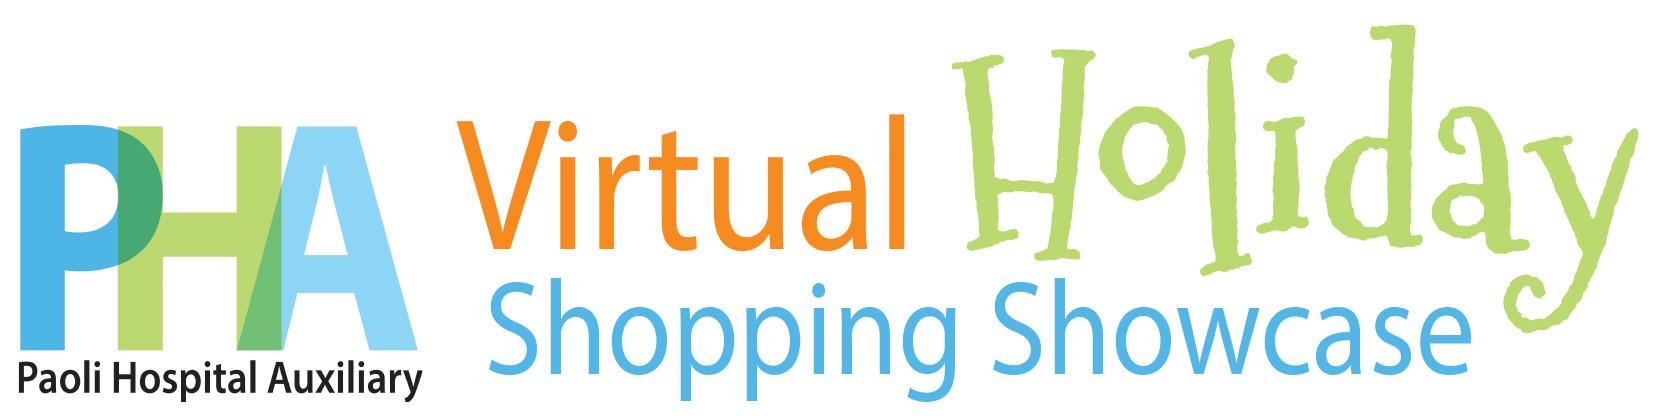 Virtual Holiday Shopping Showcase